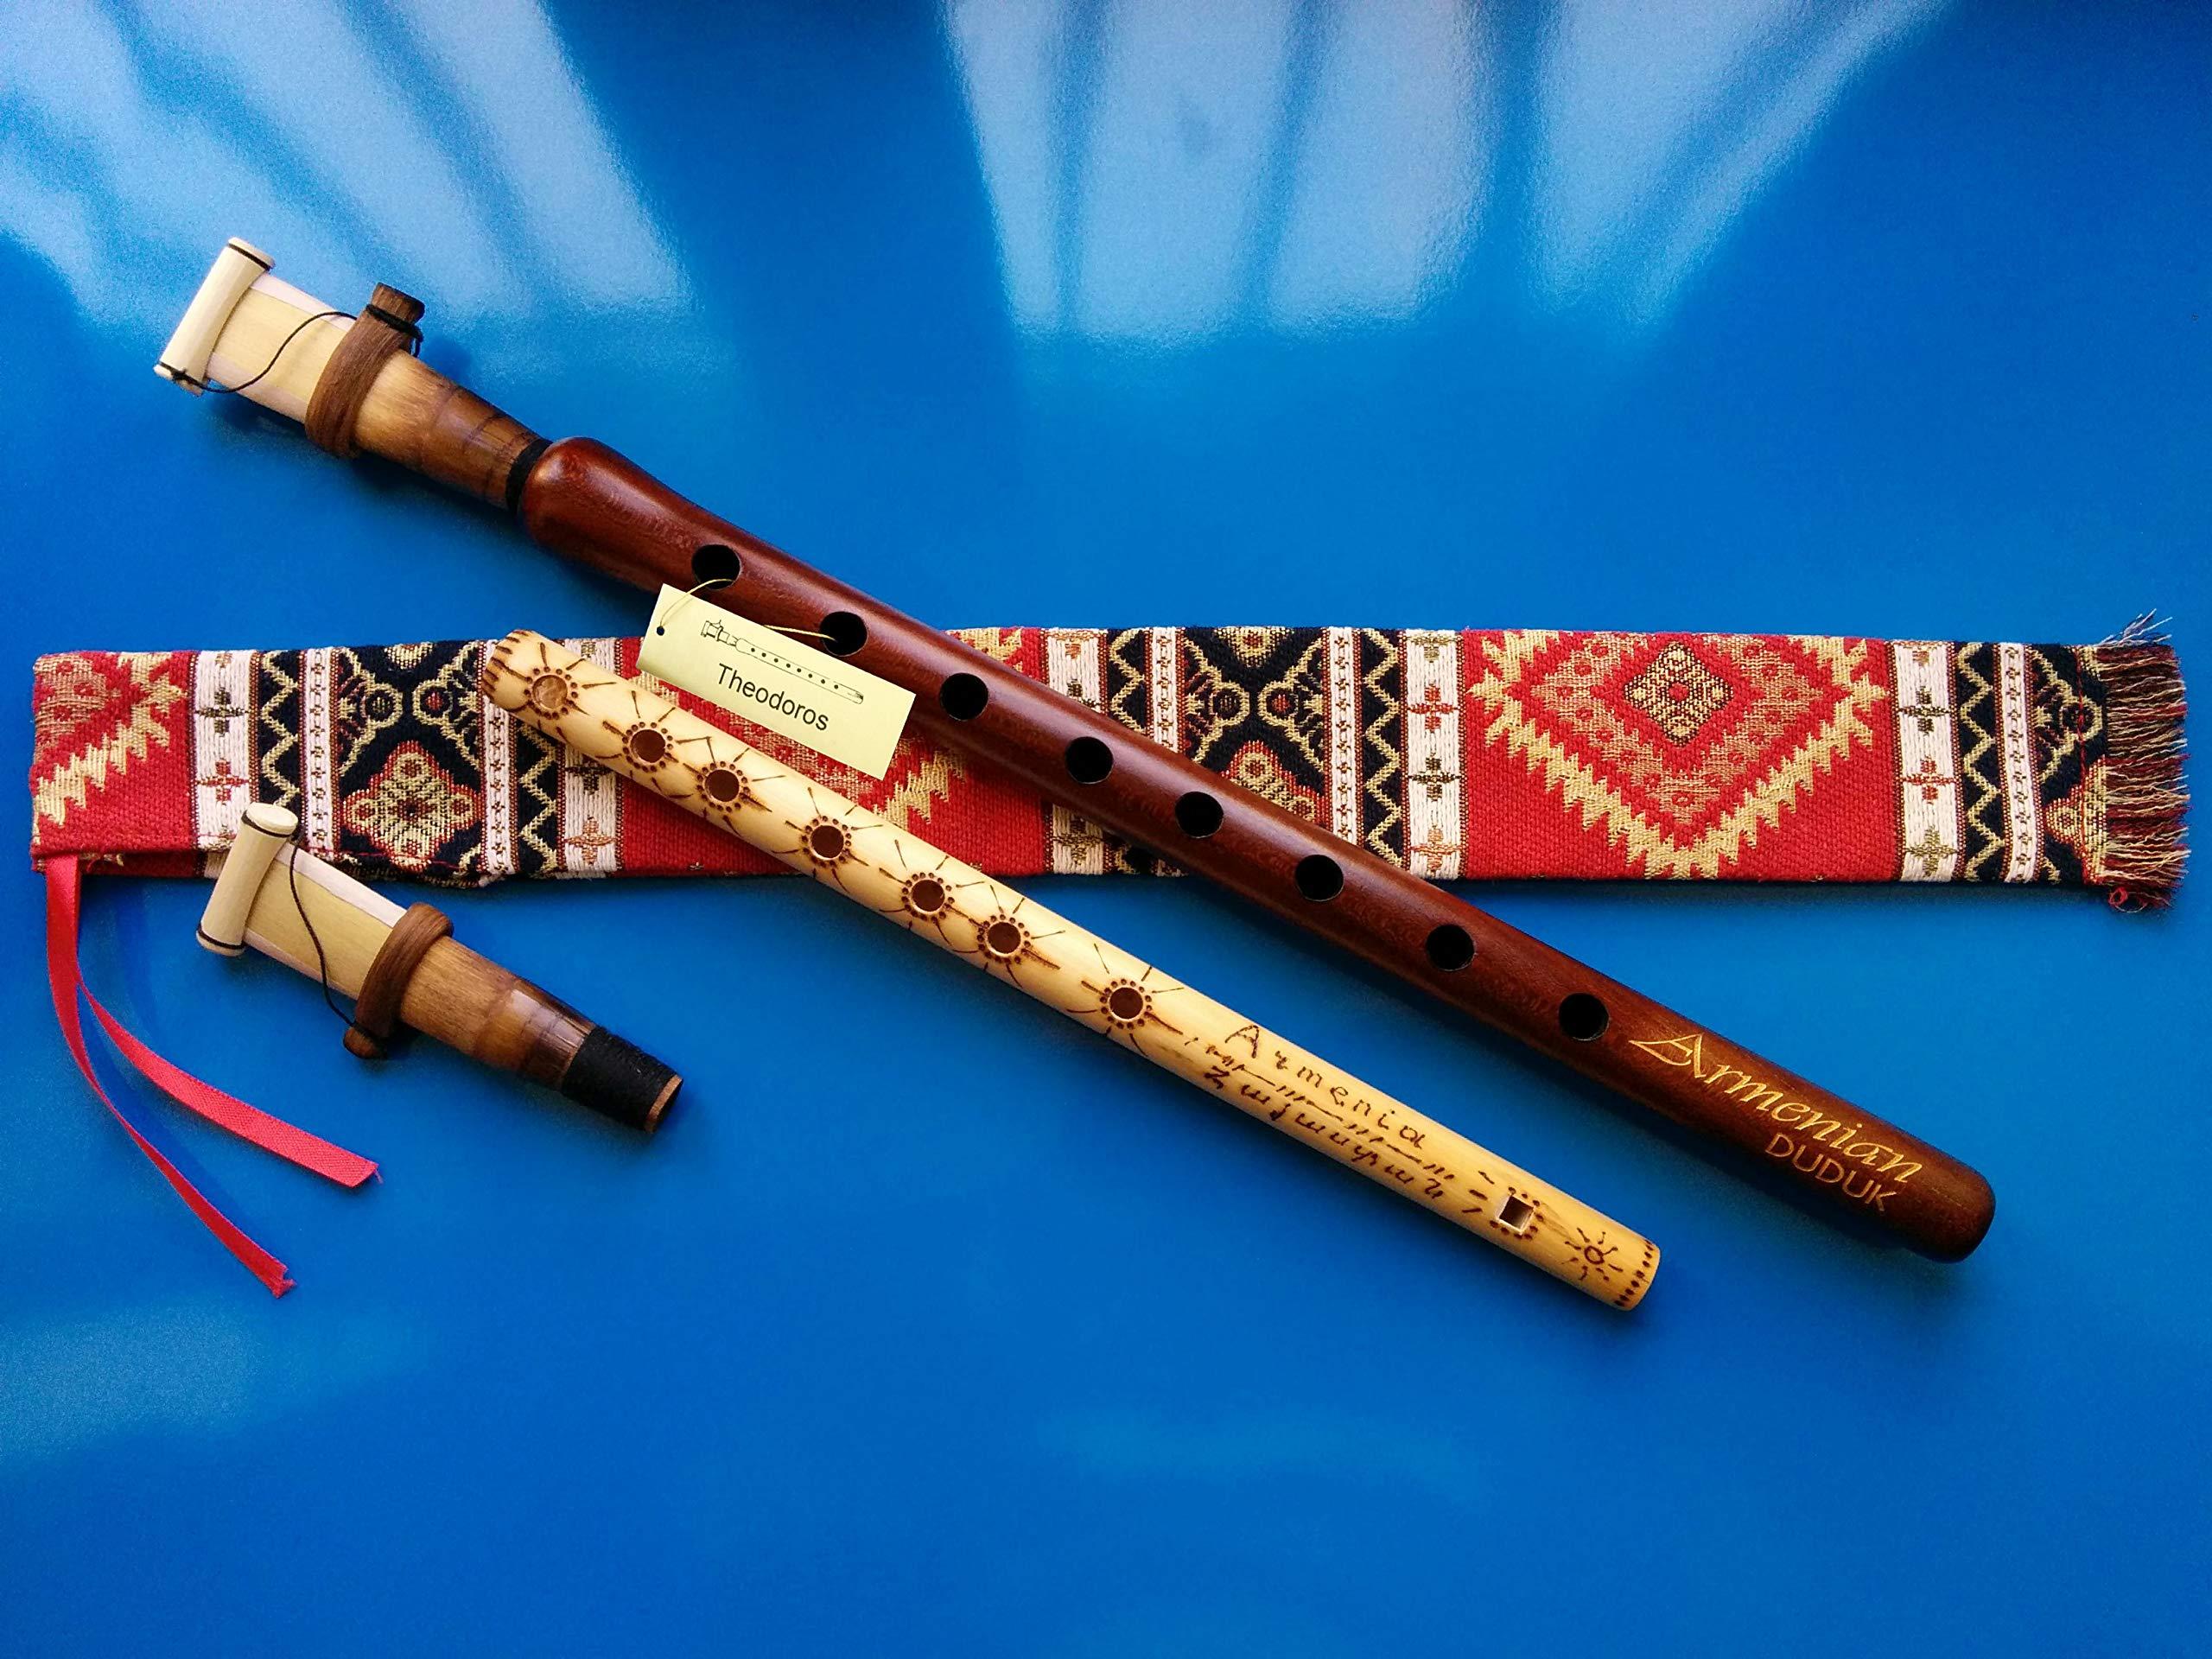 Sorna surnay birbyne lettish horn surla sornai dili Armenian Professional ZURNA by Misho handmade woodwind instrument Gift Armenian flute